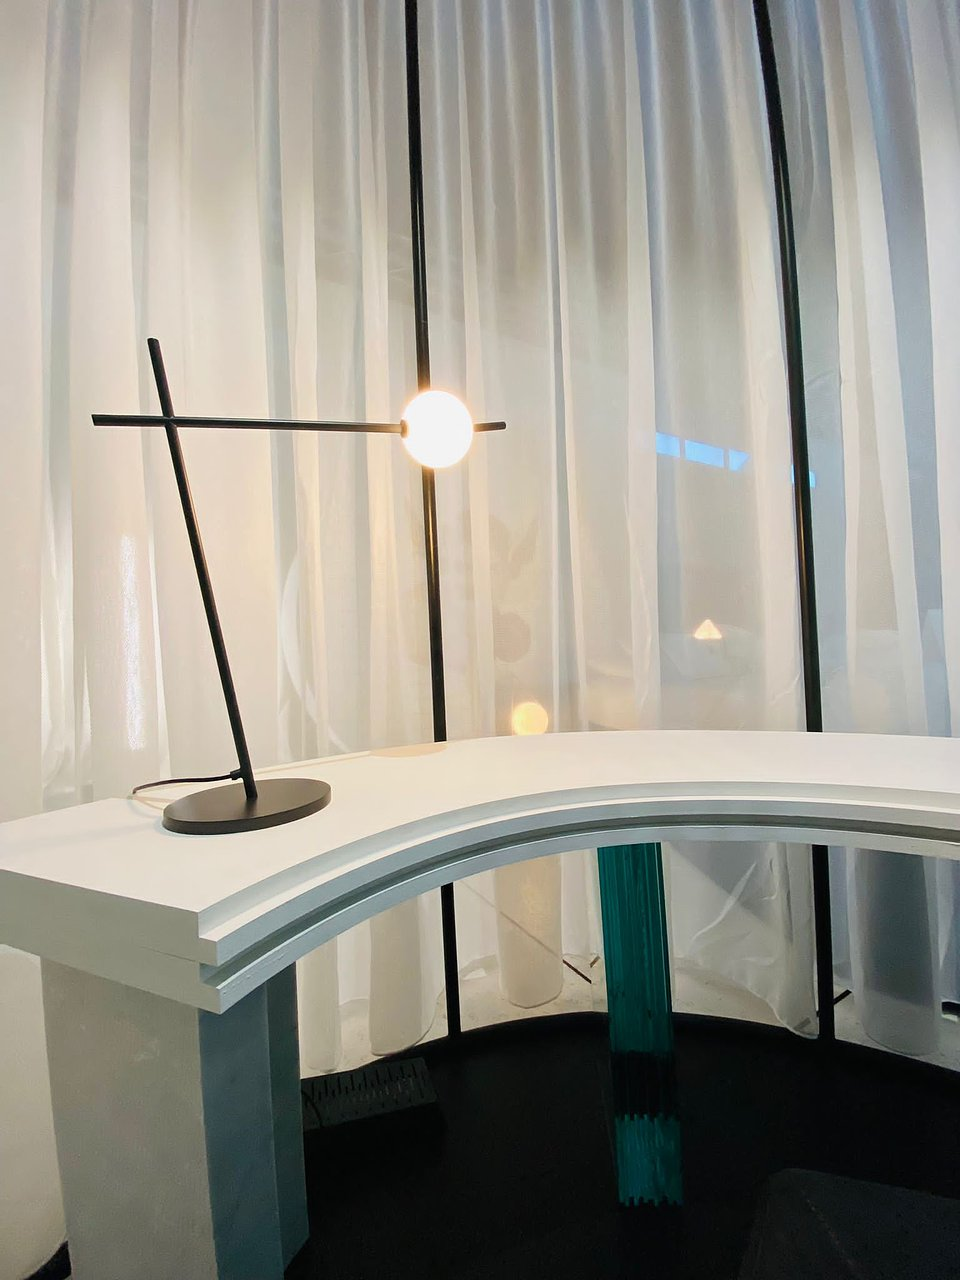 Rooms - Emanuele Svetti _SIA Design Hospitality - Surreale 2 Stelle Lusso (3).jpg